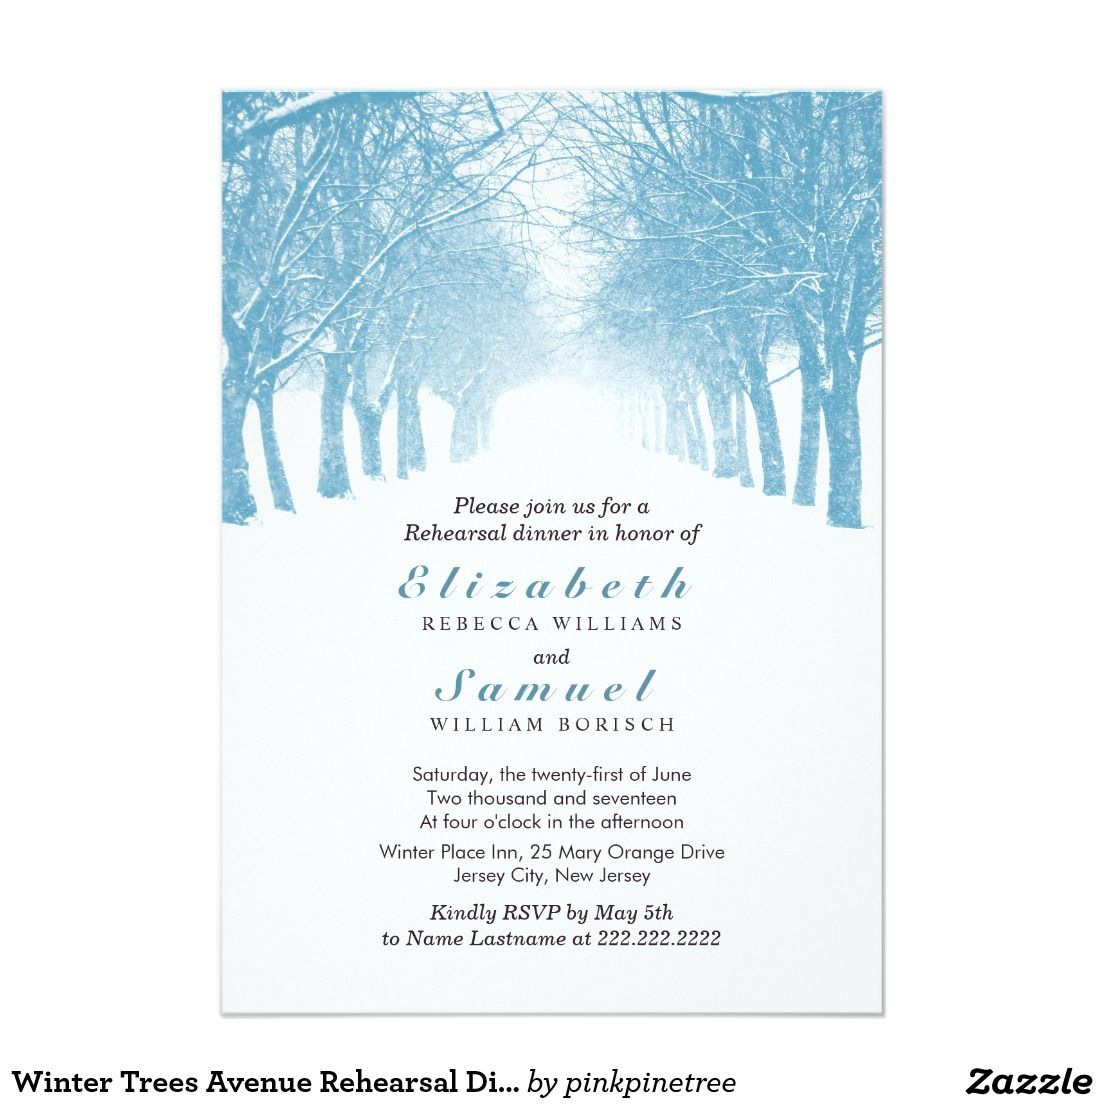 dd2557decffb Winter Trees Avenue Rehearsal Dinner Invitation